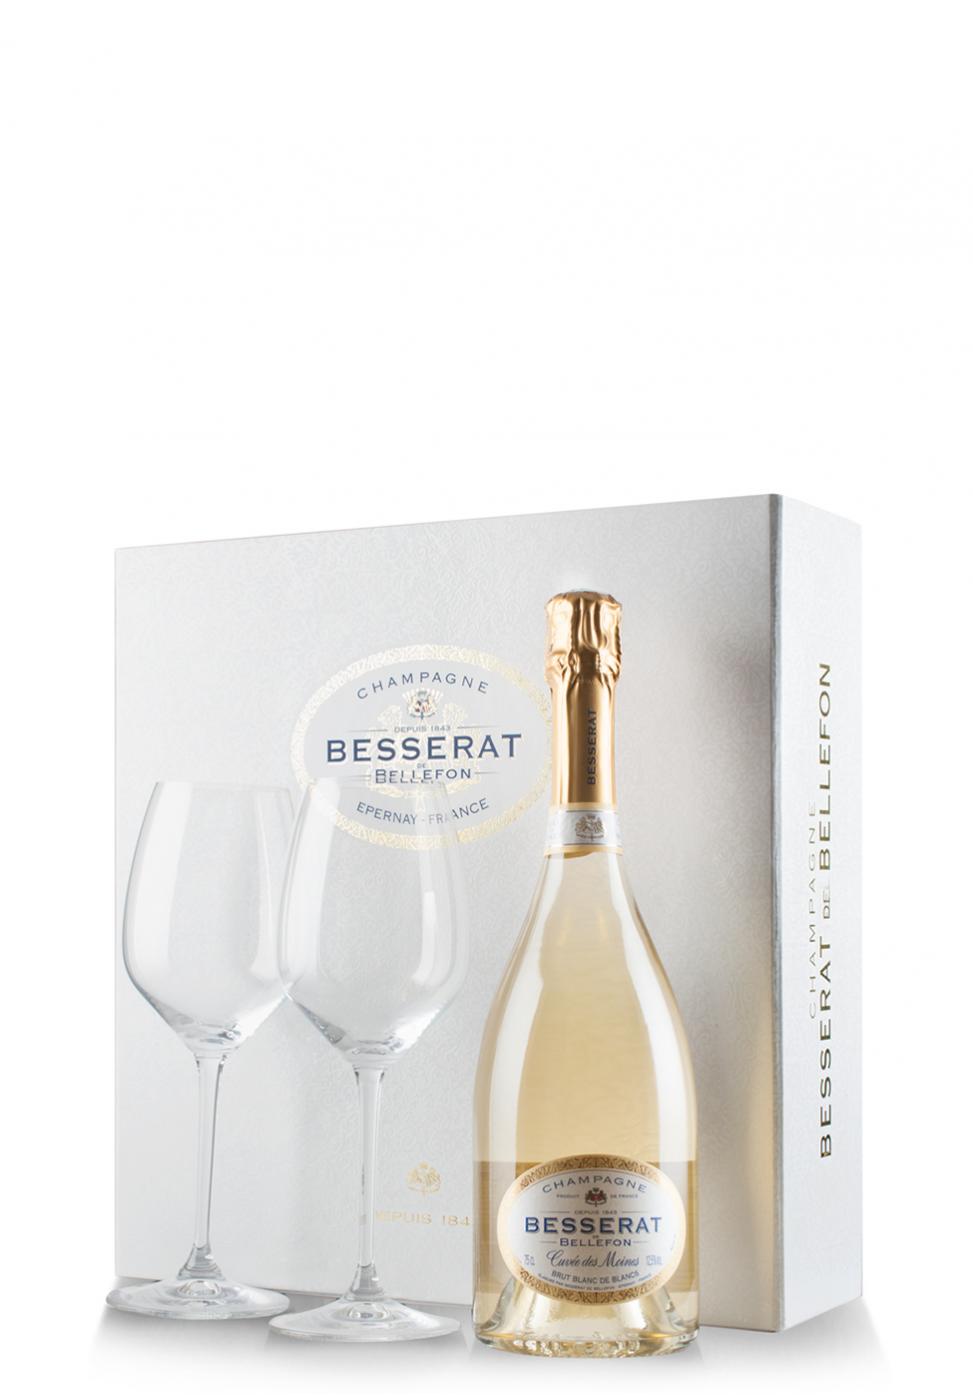 Giftset champagne besserat de bellefon for Belle jardin blanc de blancs